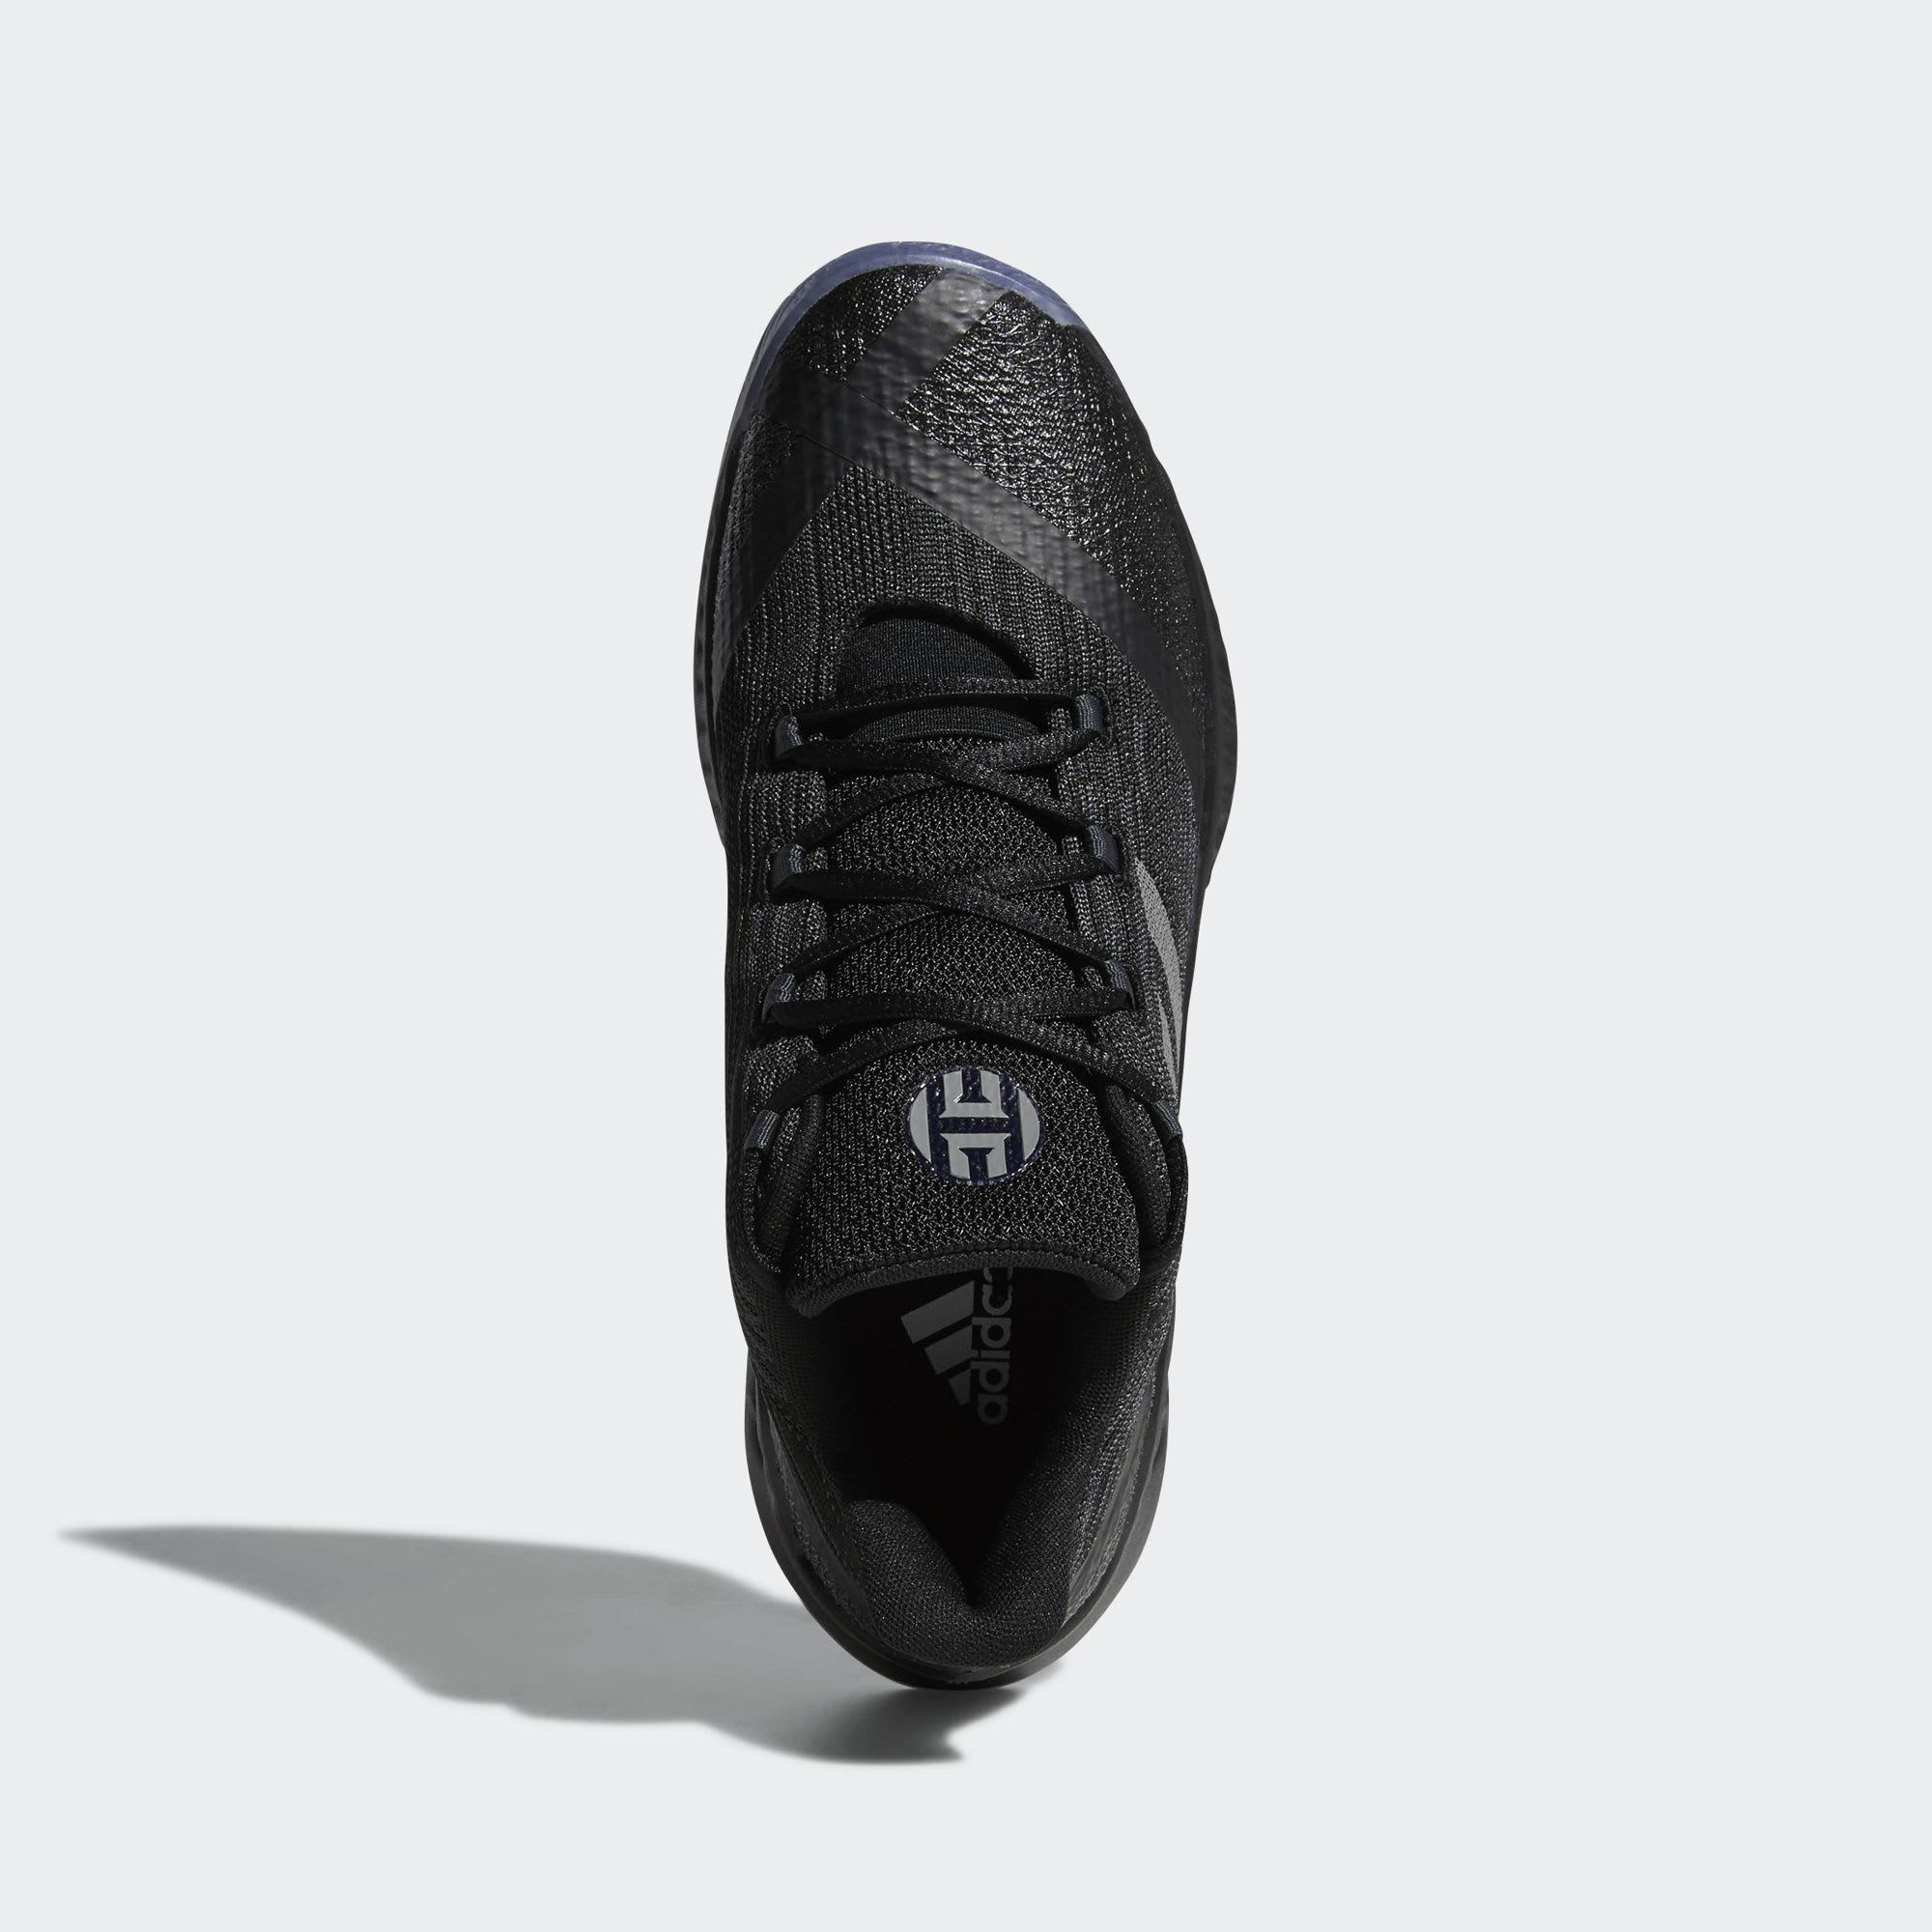 d36bb970108a ... real image via us11 adidas harden b e 2 black grey top 9228f 314fa